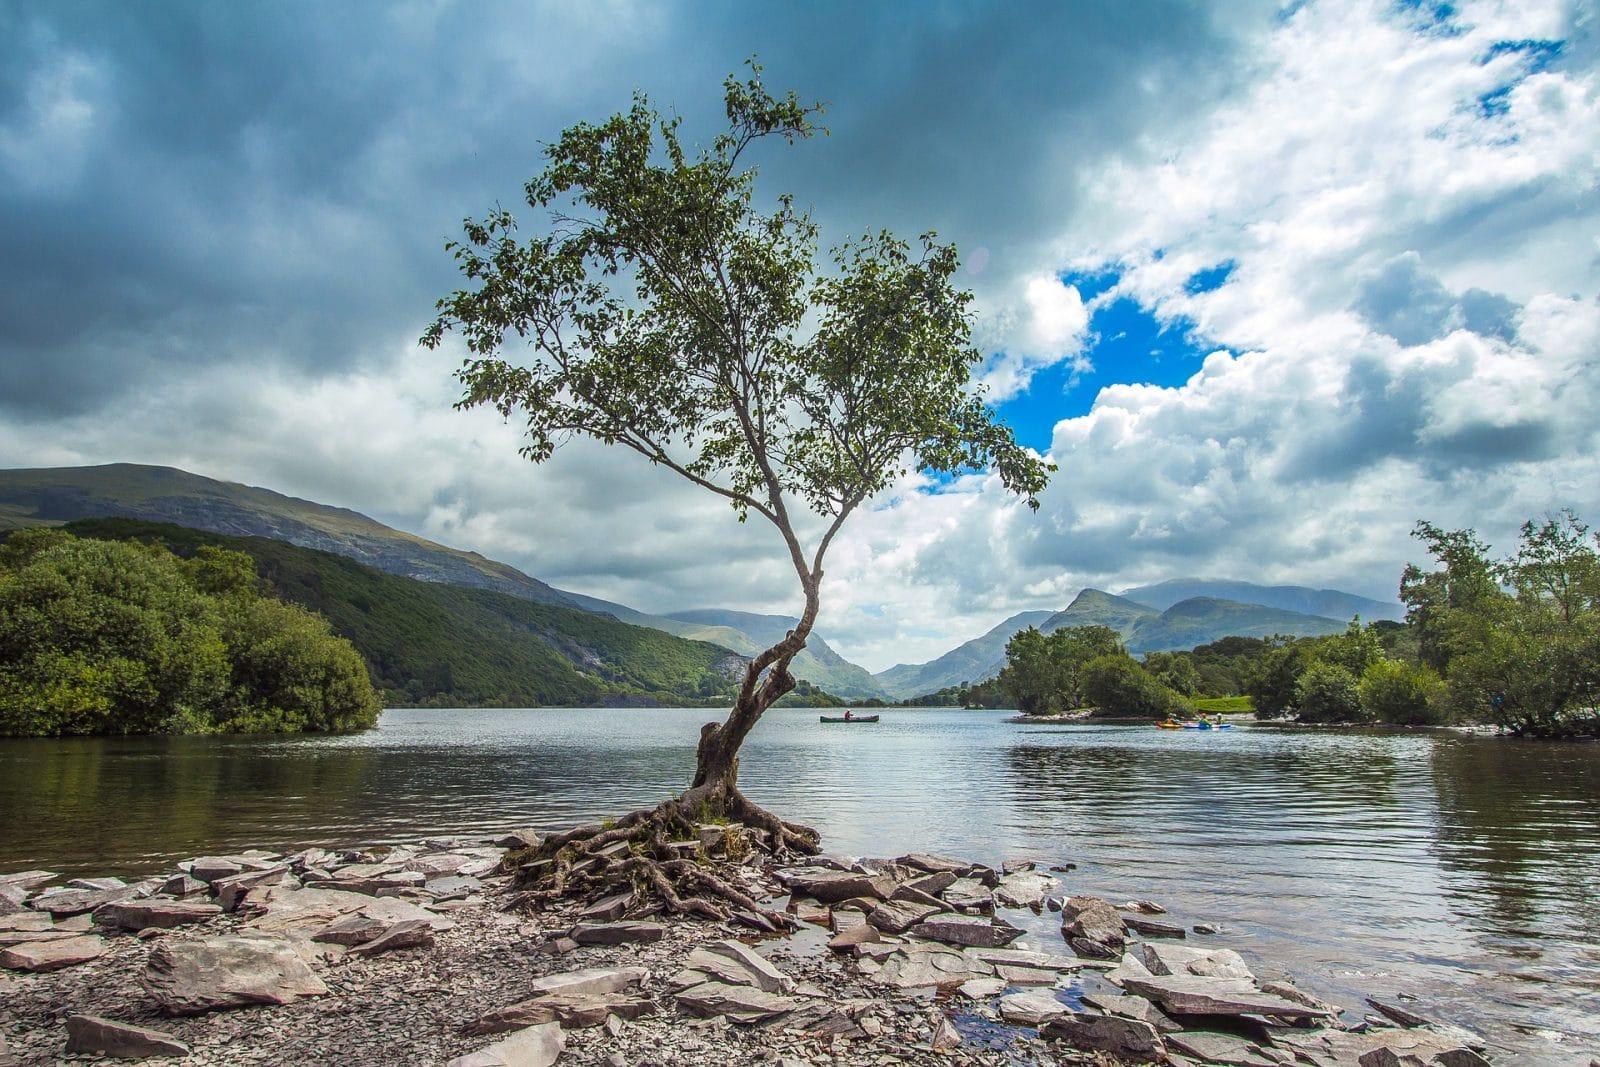 Snowdonia tree by lake